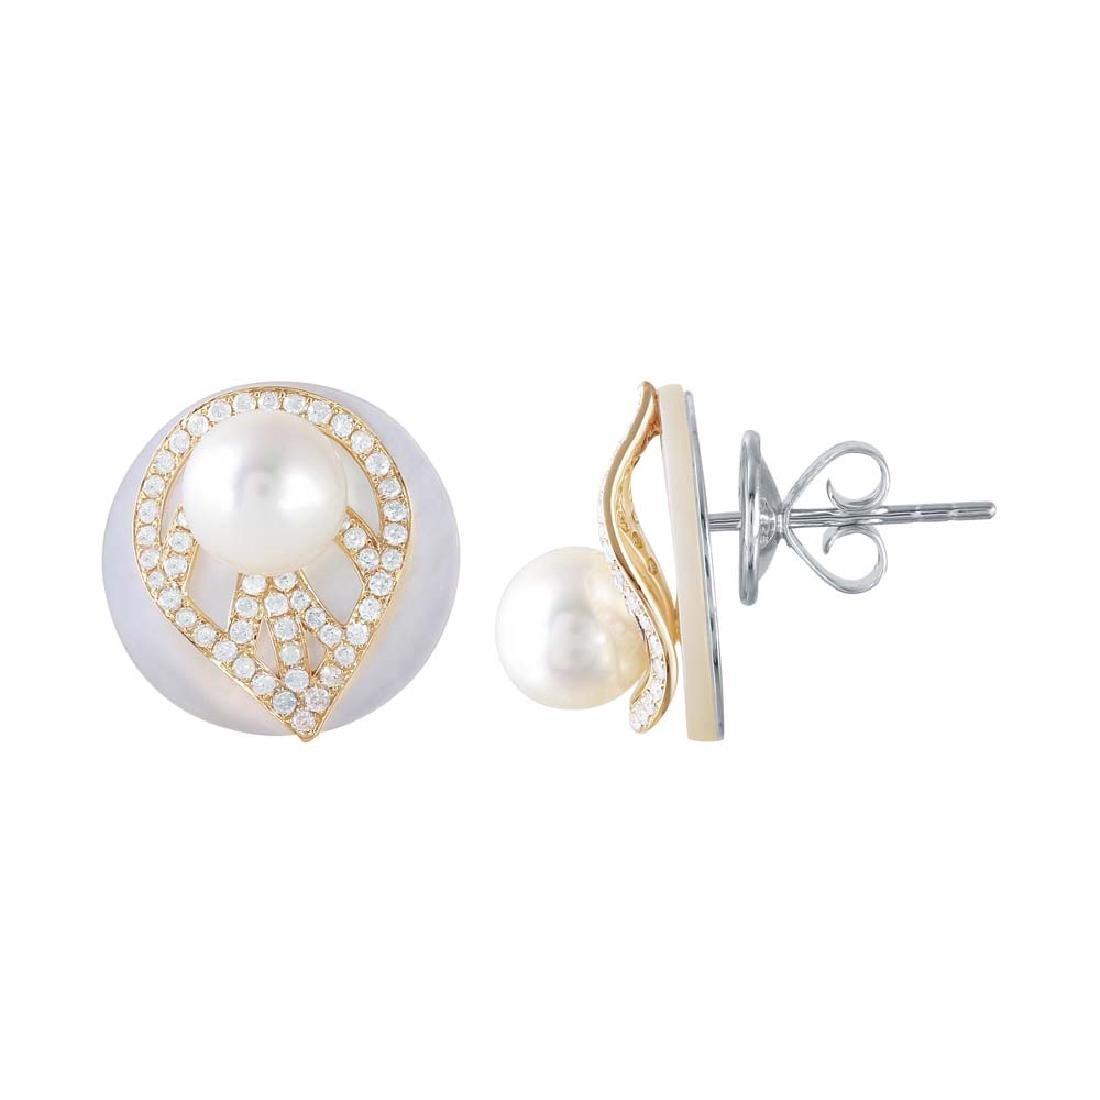 14K Gold 0.56 CTW Diamond & Pearl Earring